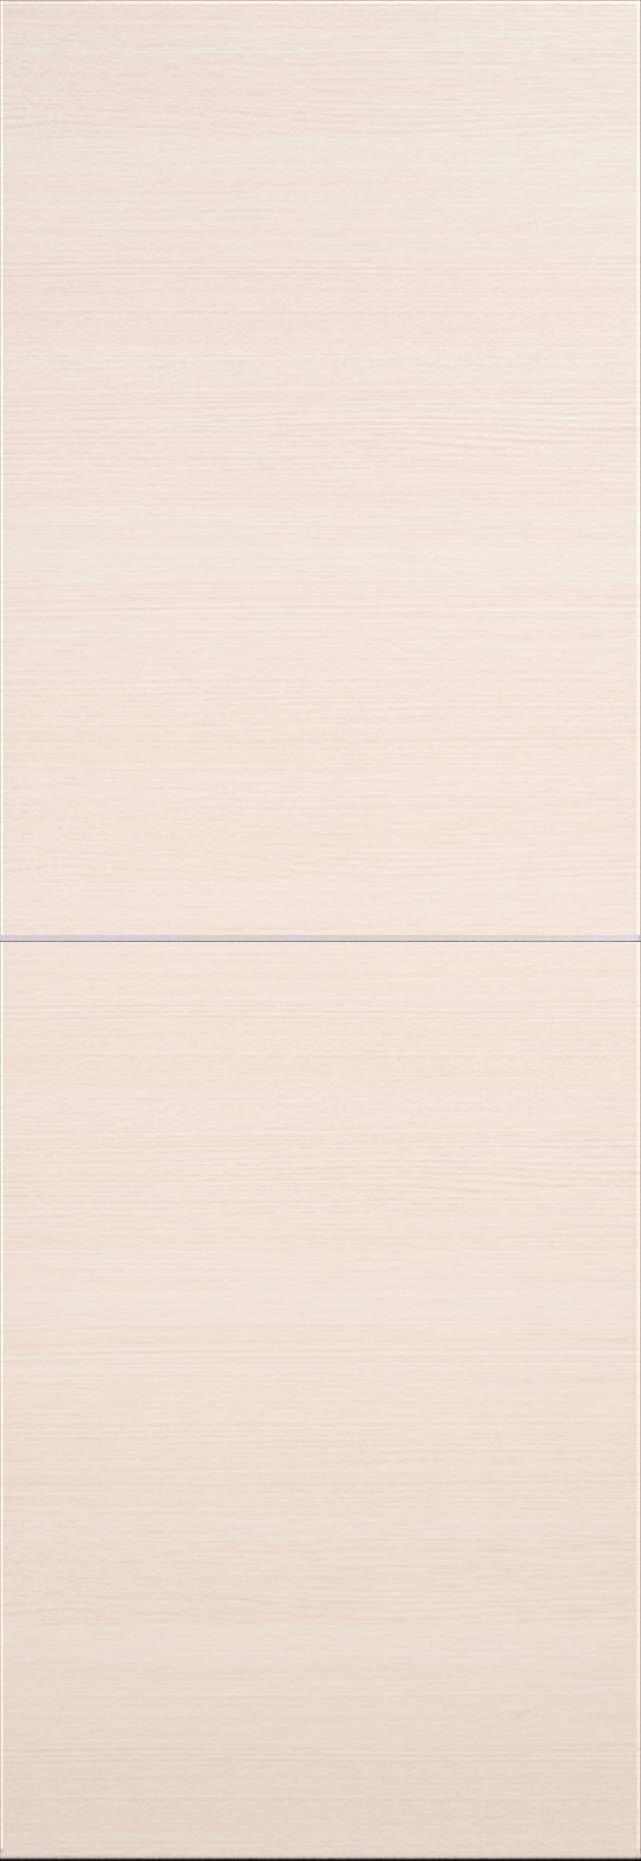 Tivoli Б-3 Invisible цвет - Беленый дуб Без стекла (ДГ)